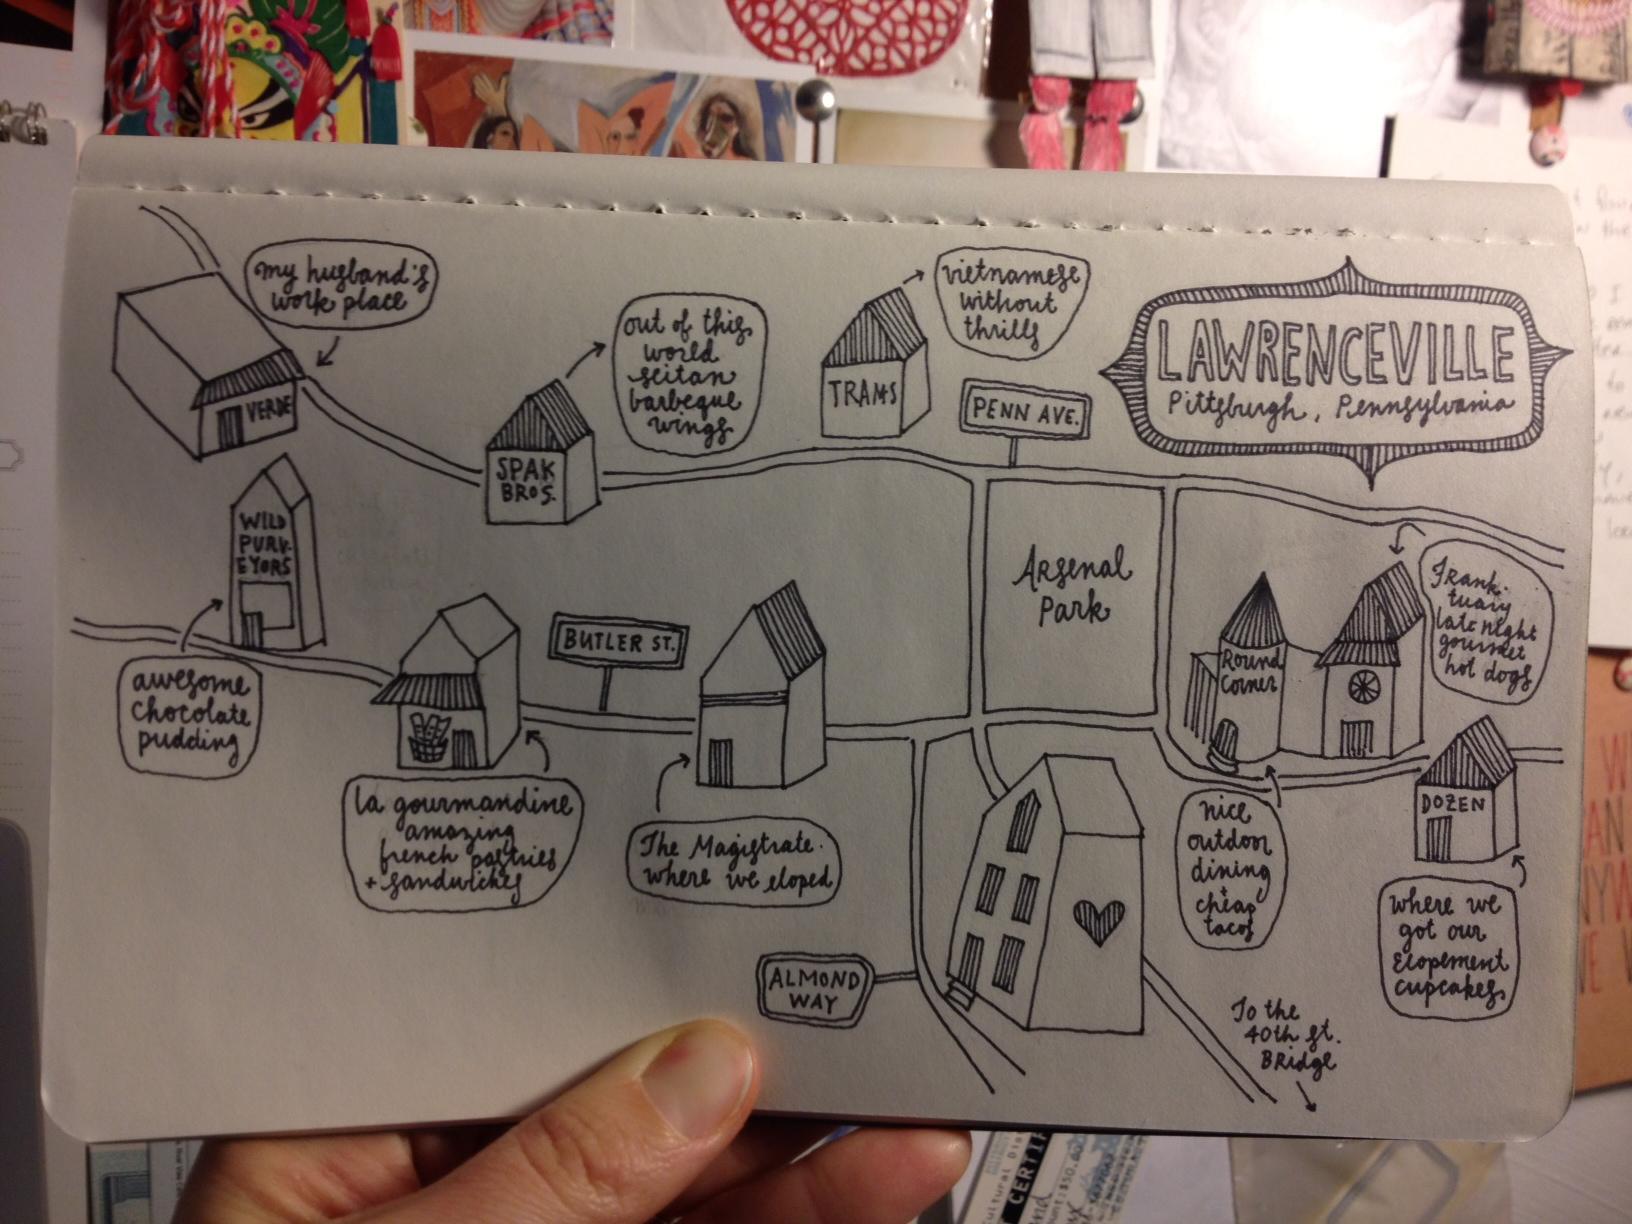 pittsburgh // neighborhoods // drawings  - image 6 - student project